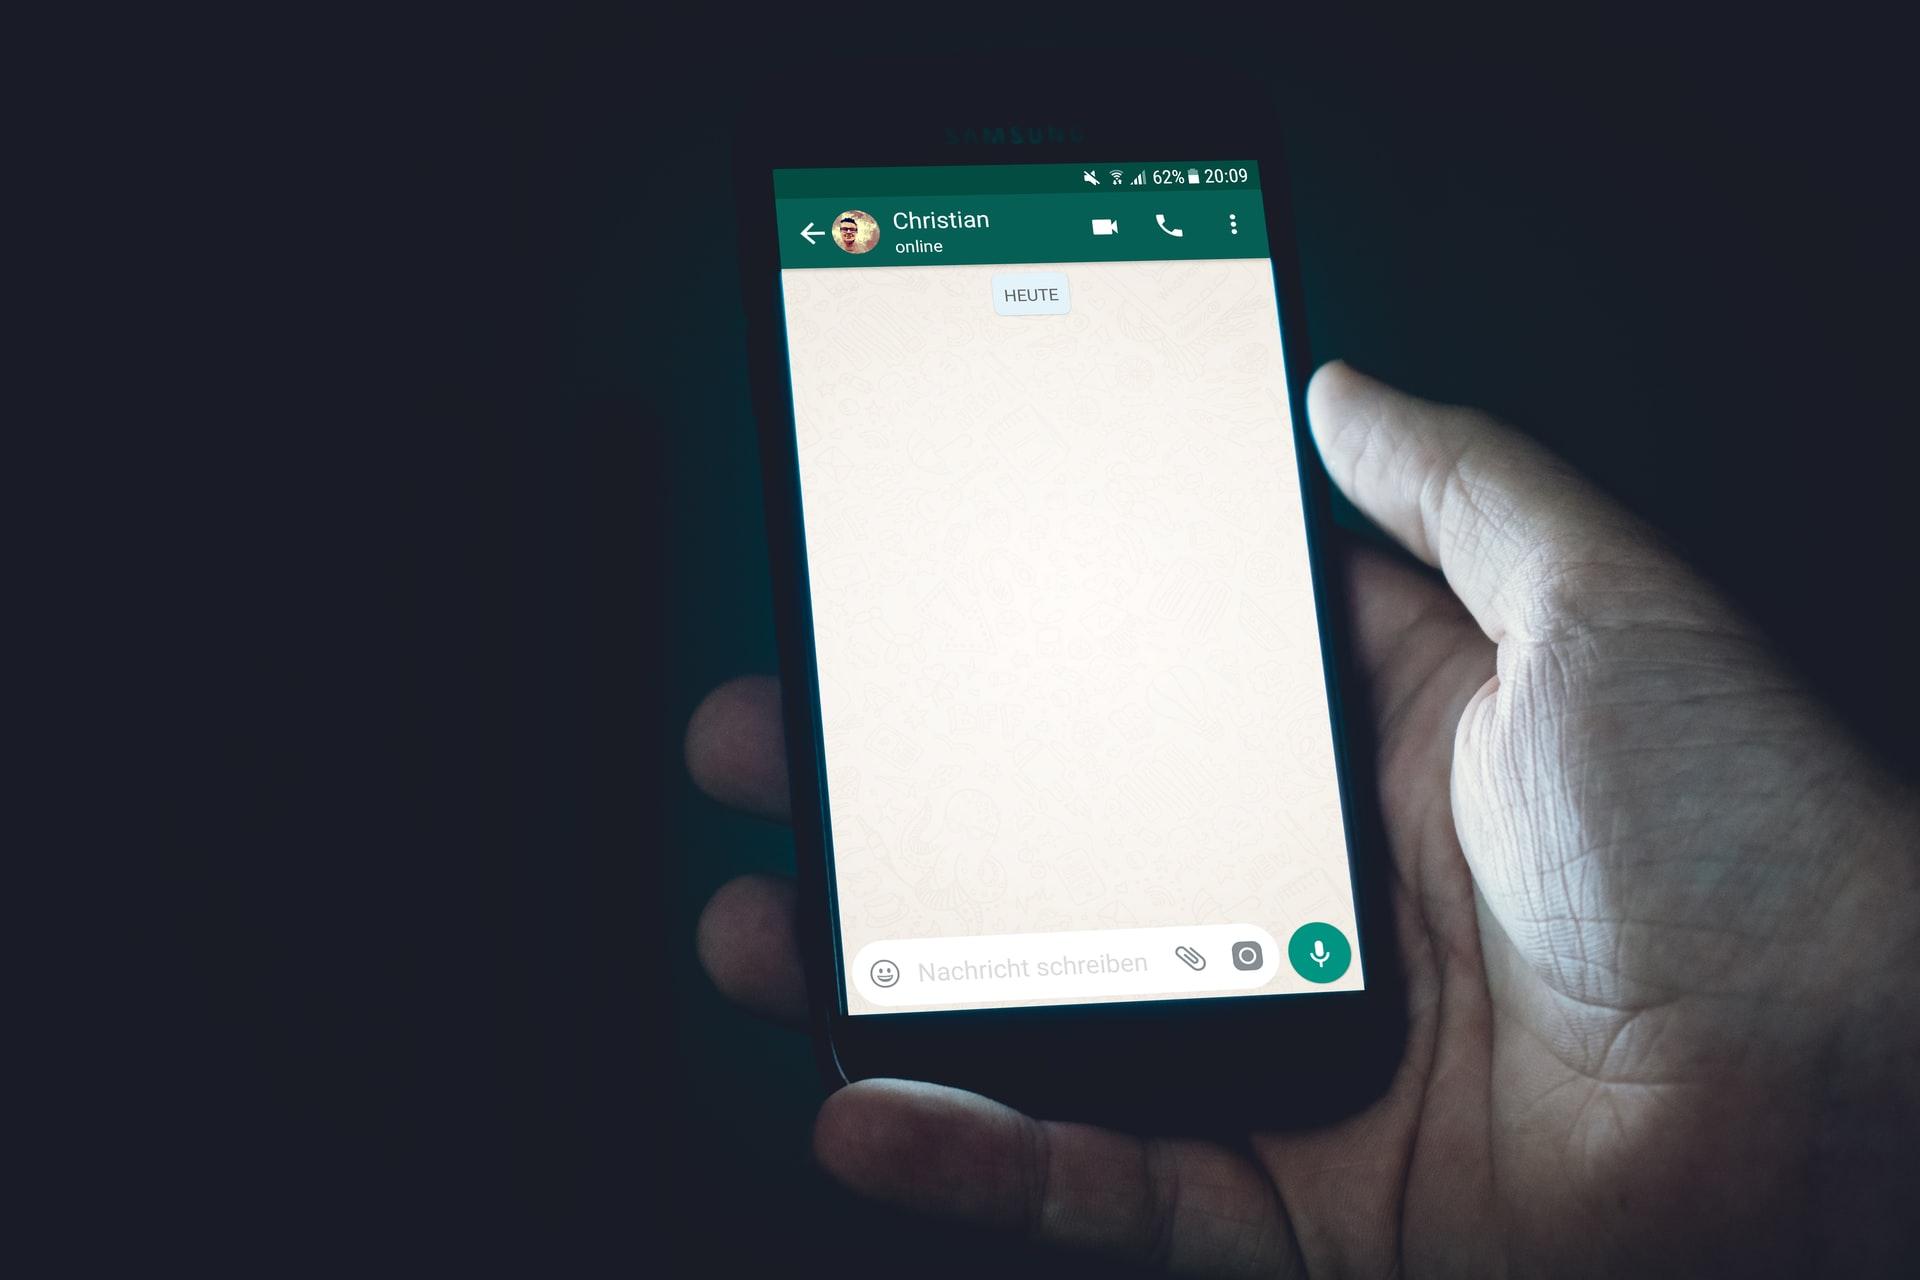 Indonesian Kata.ai Raises Series B to Improve Interaction Between Humans And Computers